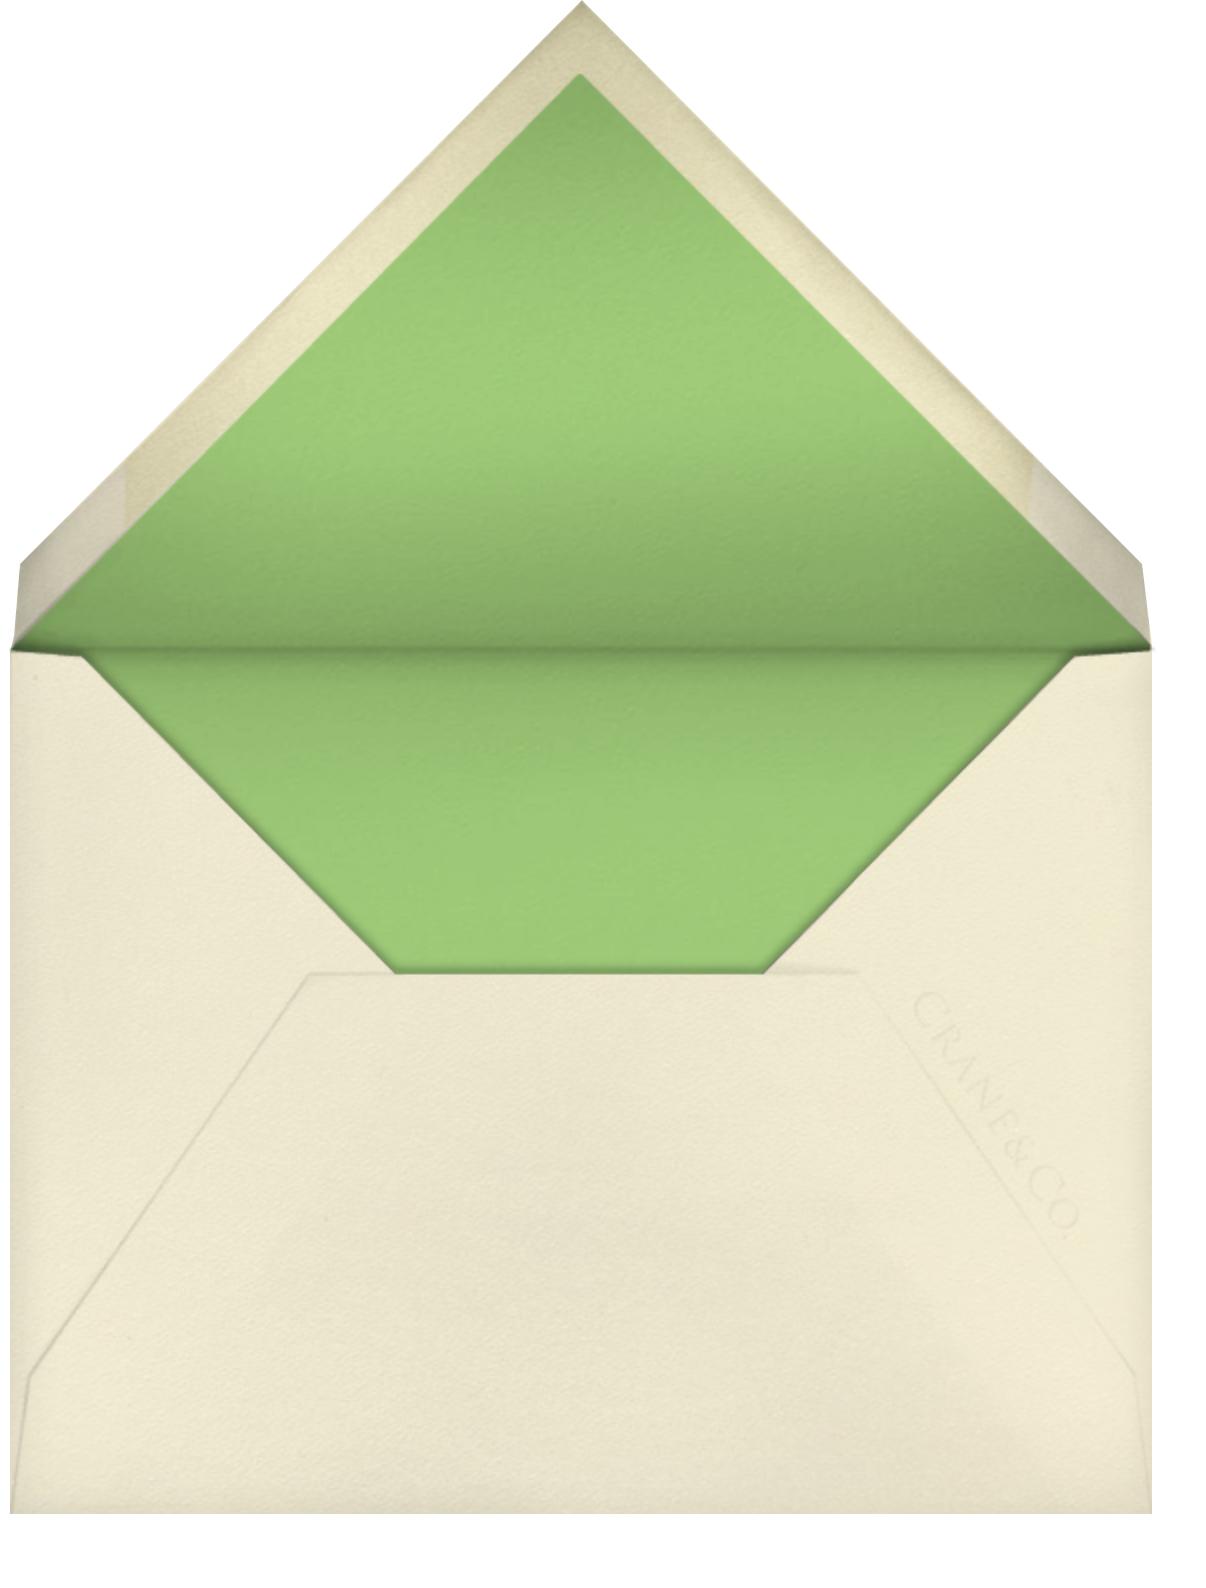 Typographic I (Thank You) - kate spade new york - General - envelope back